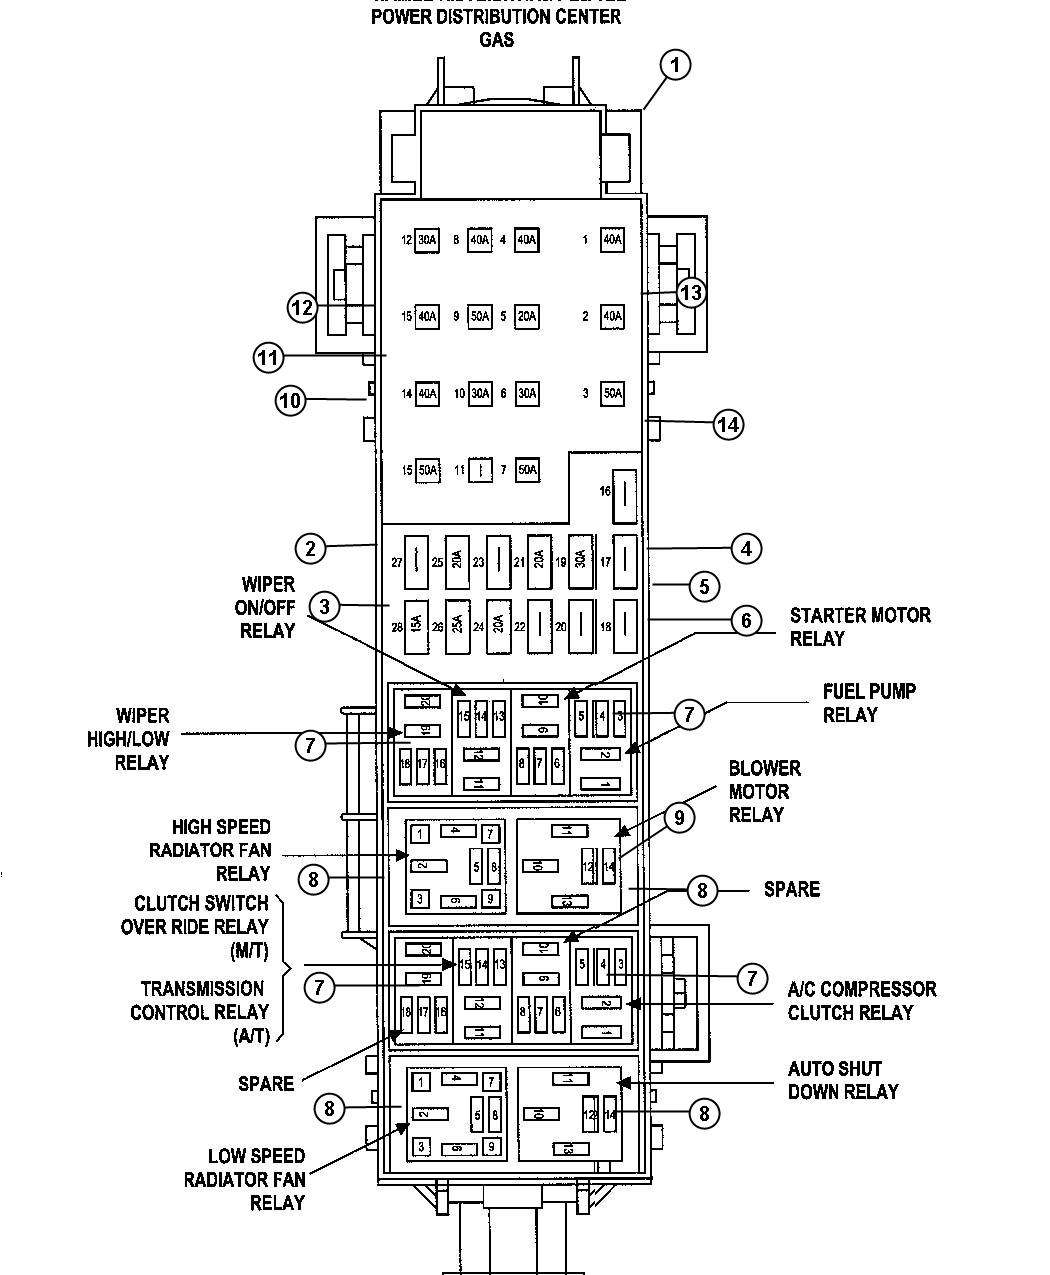 i2243488  L Jeep Liberty Wiring Harness Diagram on jeep grand cherokee trailer wiring harness, jeep liberty vacuum line diagram, jeep liberty pulley diagram, jeep liberty hitch wiring, jeep liberty serpentine belt diagram, jeep liberty timing chain diagram, 2004 jeep wrangler diagram, jeep liberty radio harness diagram, jeep wrangler ac wiring diagram, 2000 jeep cherokee sport wiring diagram, jeep wrangler trailer wiring, jeep liberty 3.7 engine diagram, 2011 wrangler wiring diagram, jeep liberty electrical diagram, jeep liberty ignition wiring, jeep liberty hose diagram, jeep liberty front end diagram, jeep liberty ac wiring diagram, jeep liberty engine swap, 1996 jeep cherokee fuel pump wiring diagram,